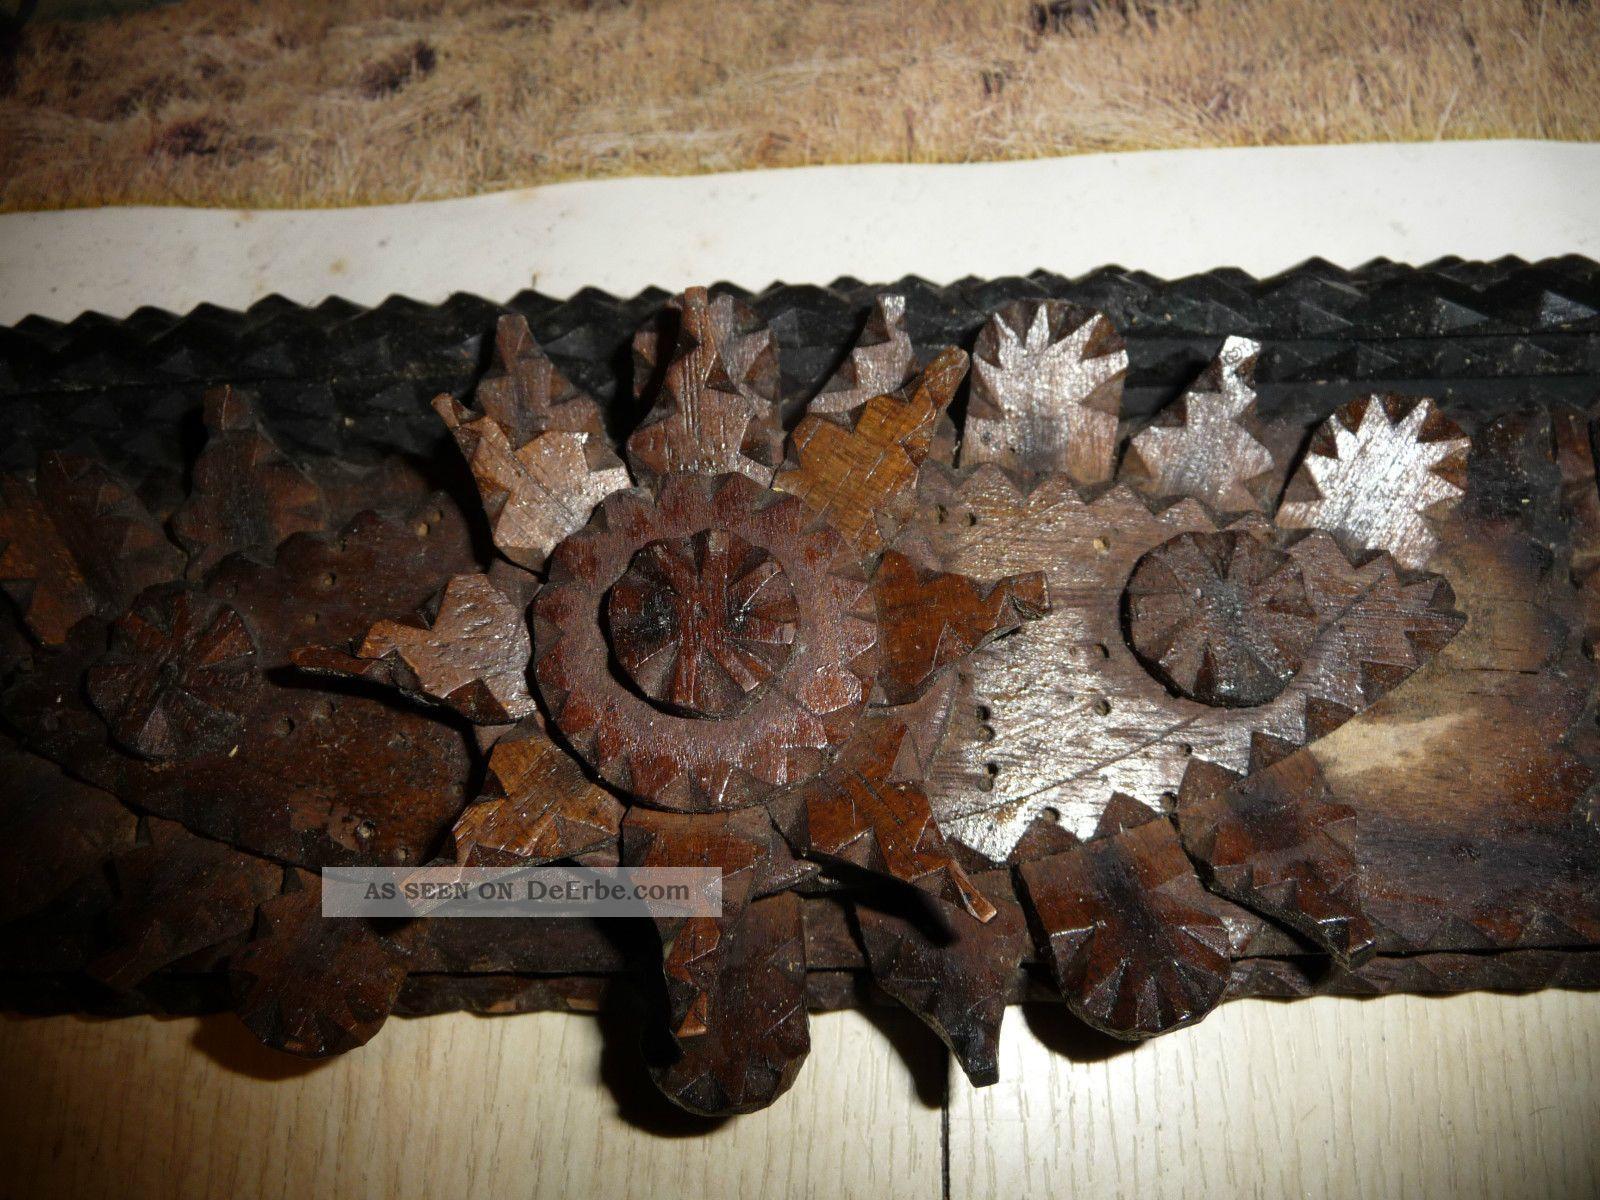 Bilderrahmen Holz Handarbeit ~ Alt, Bilderrahmen, Holzrahmen, Handarbeit Holzarbeiten Bild 3